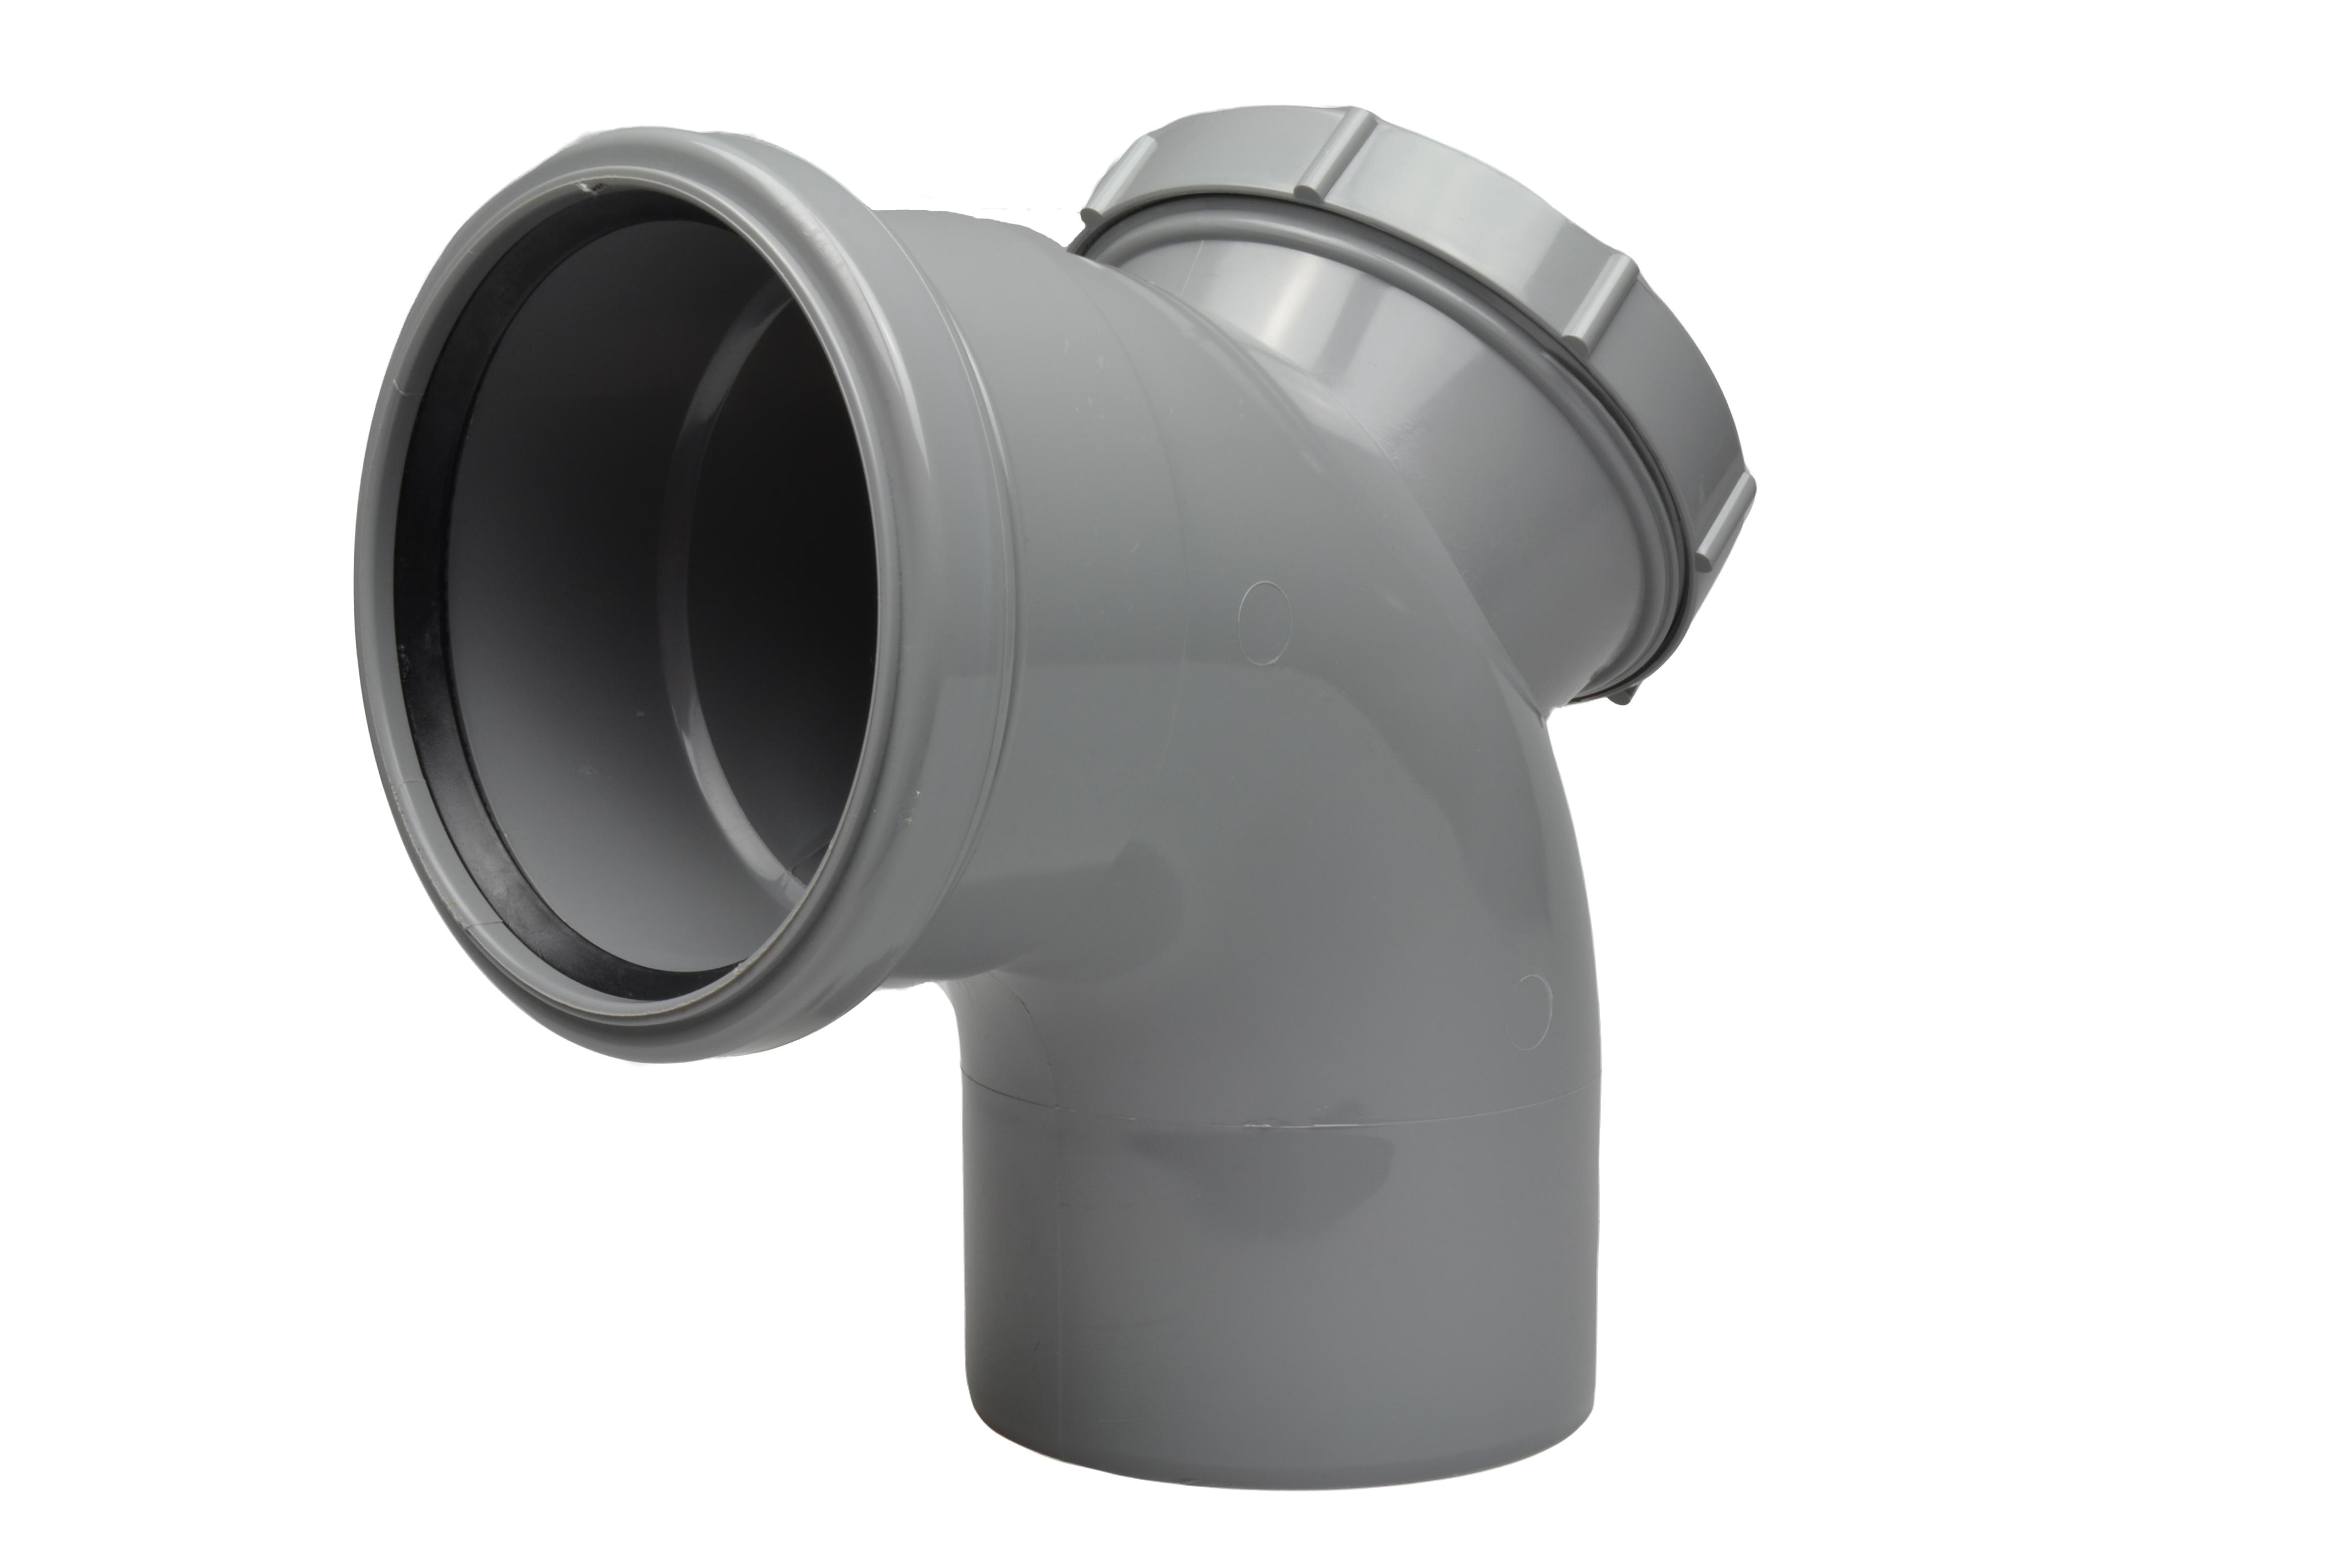 Soil Ring 92 Single Socket Access Bend 110mm - Light Grey